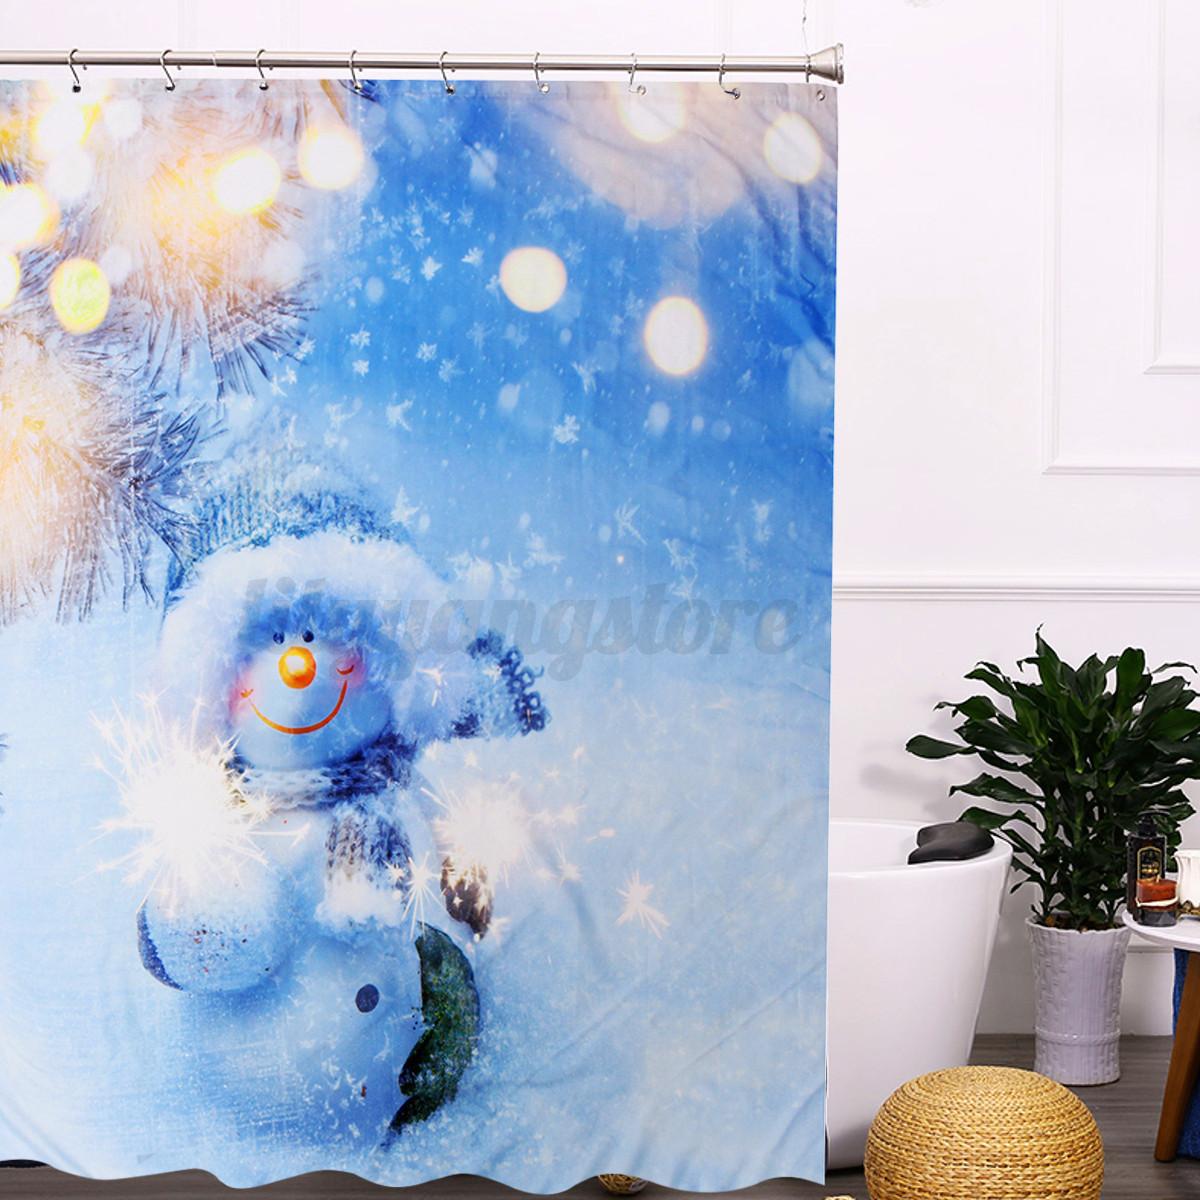 New Christmas Kids Waterproof Polyester Bathroom Shower Curtain Decor Hooks Ebay